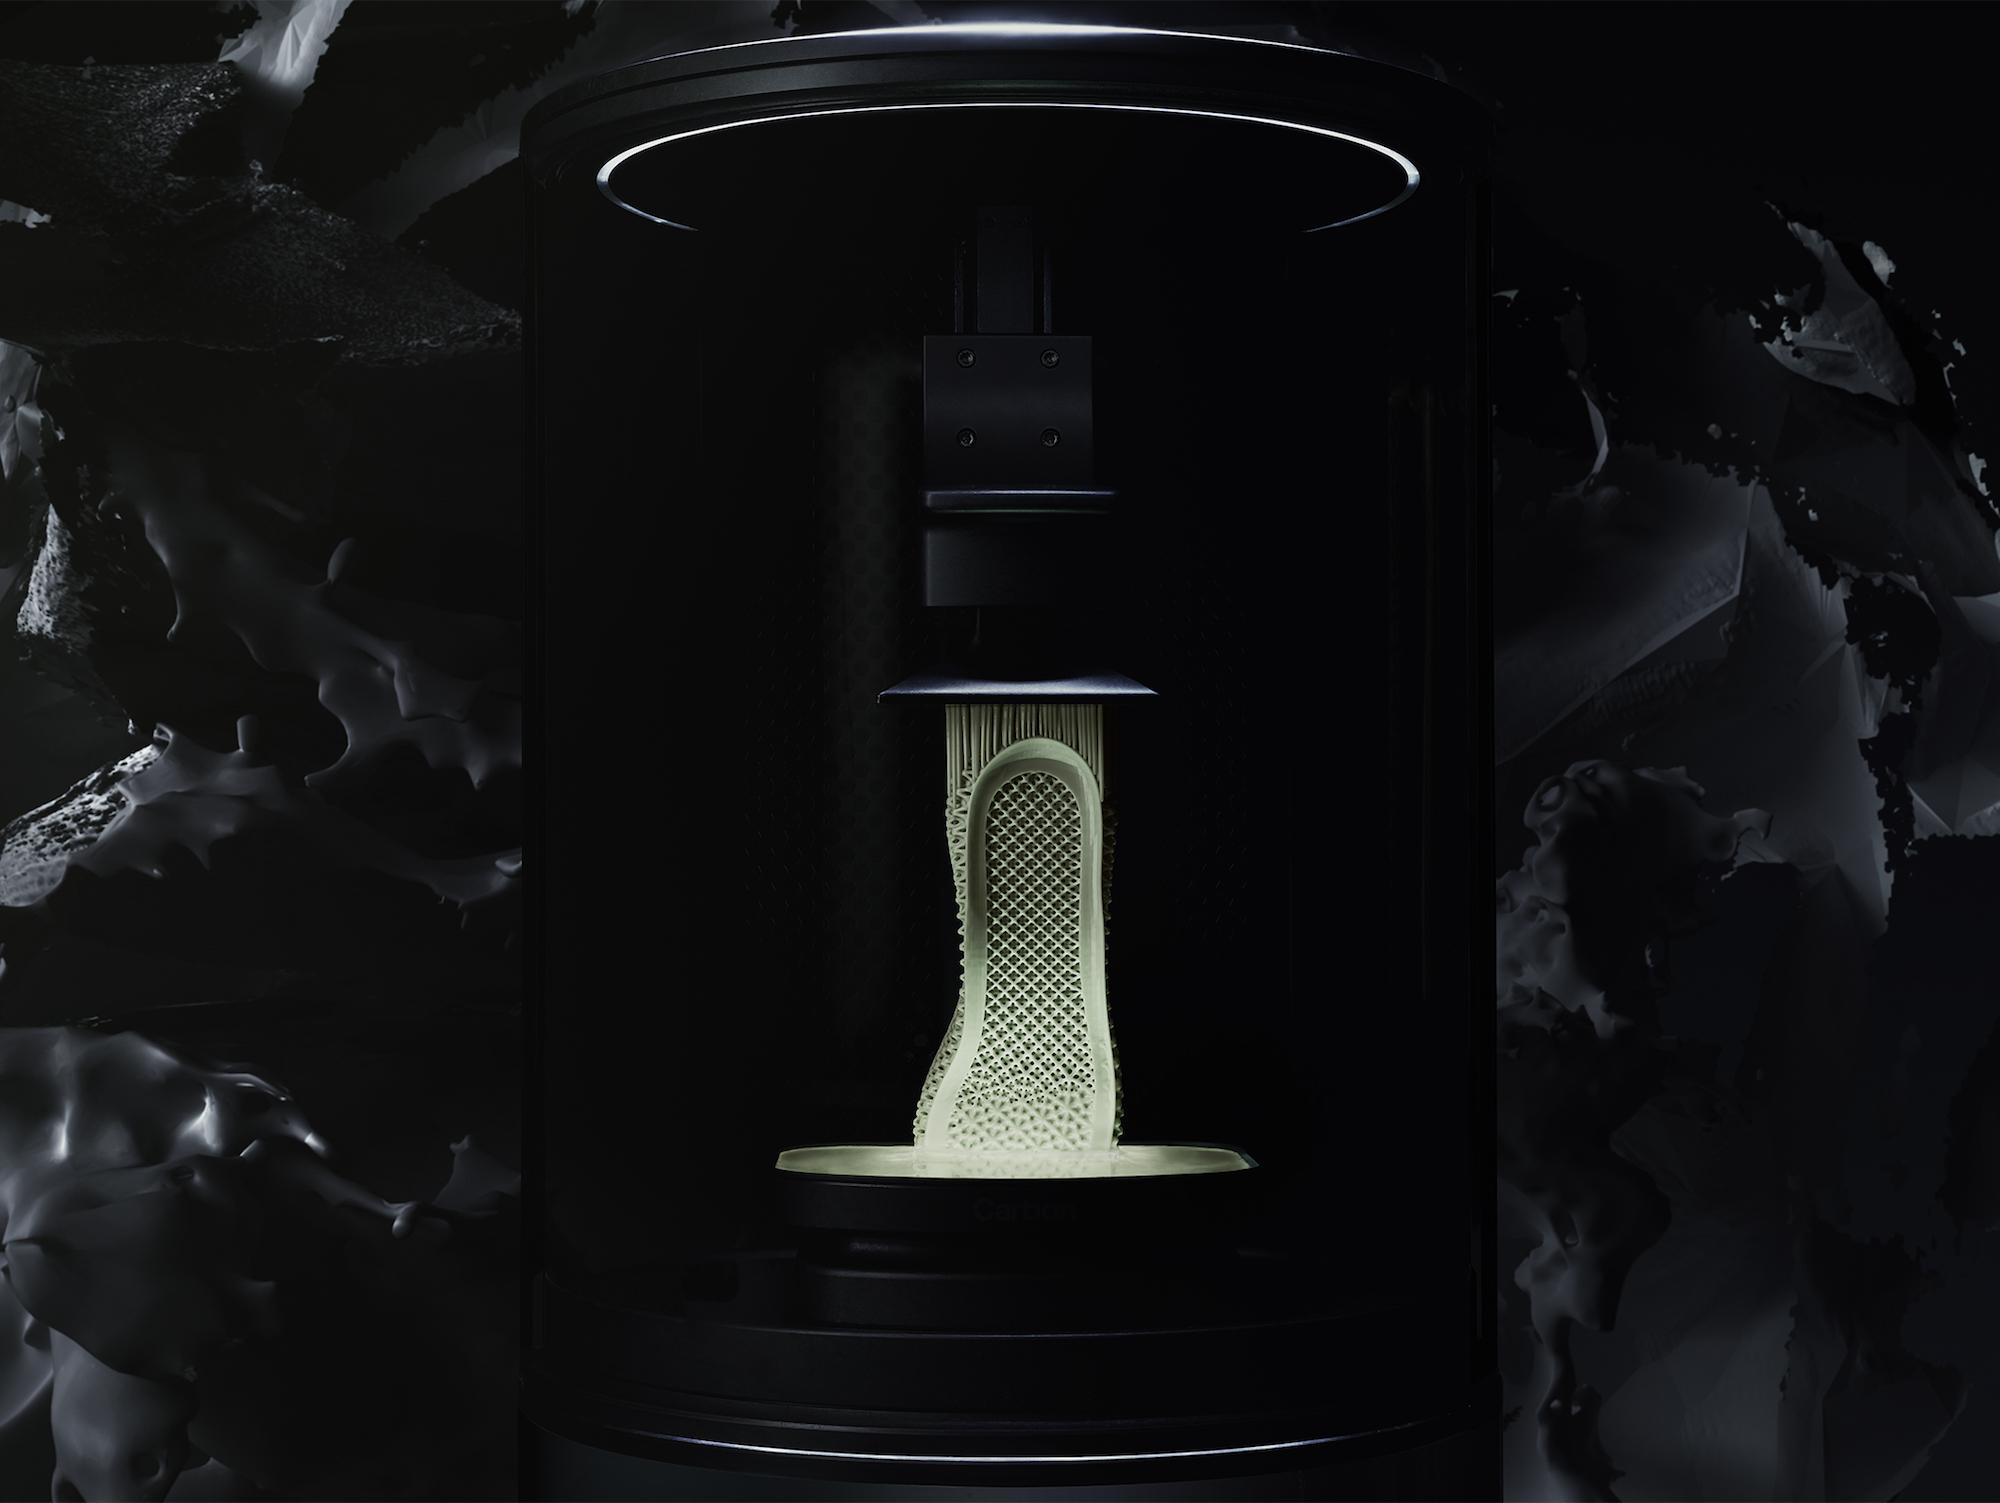 adidas futurecraft 4d carbon digital light synthesis 9